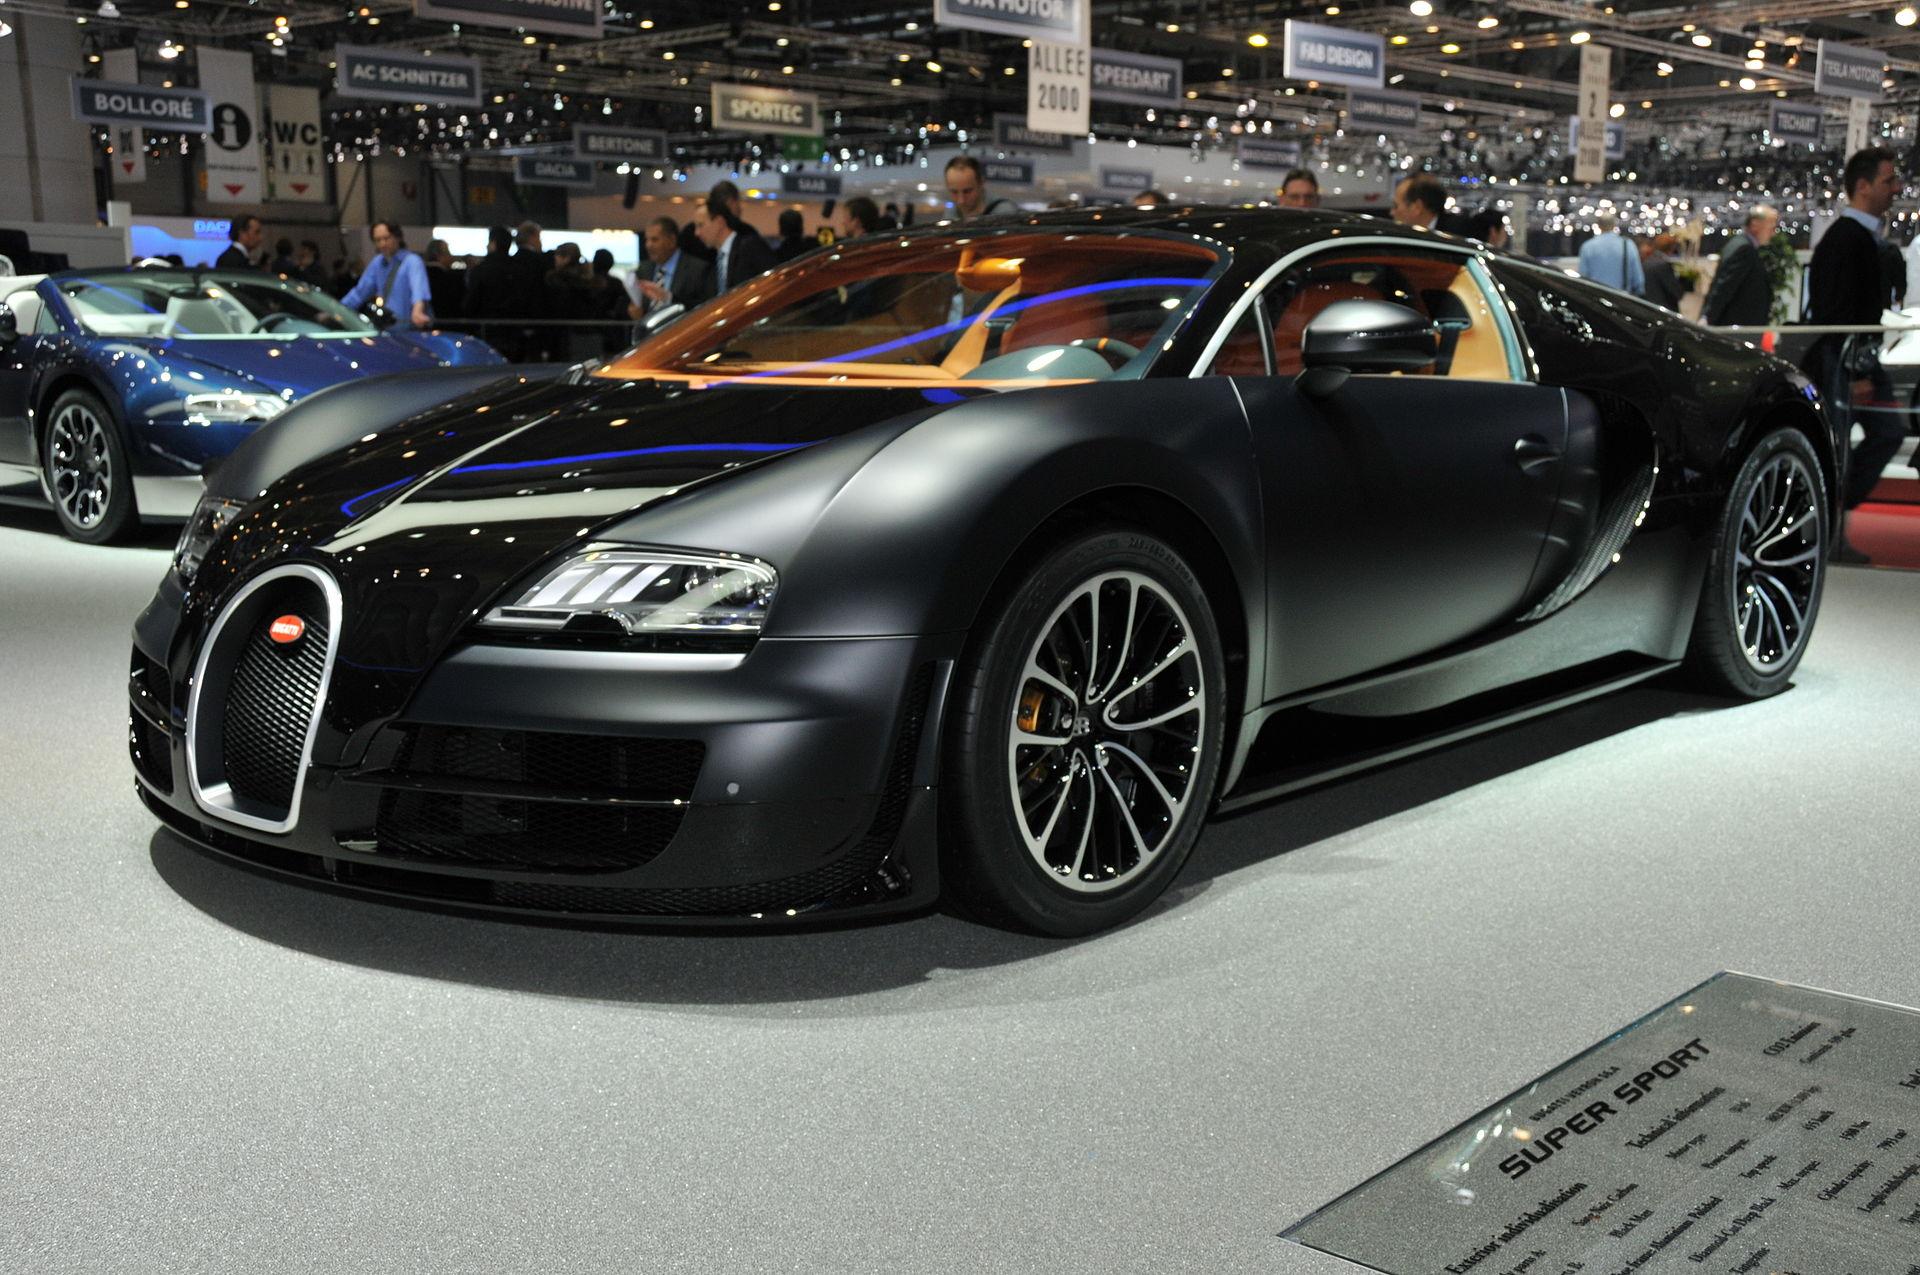 Bugatti_Veyron_Super_Sport_5491323091 Inspiring Bugatti Veyron Quarter Mile Speed Cars Trend